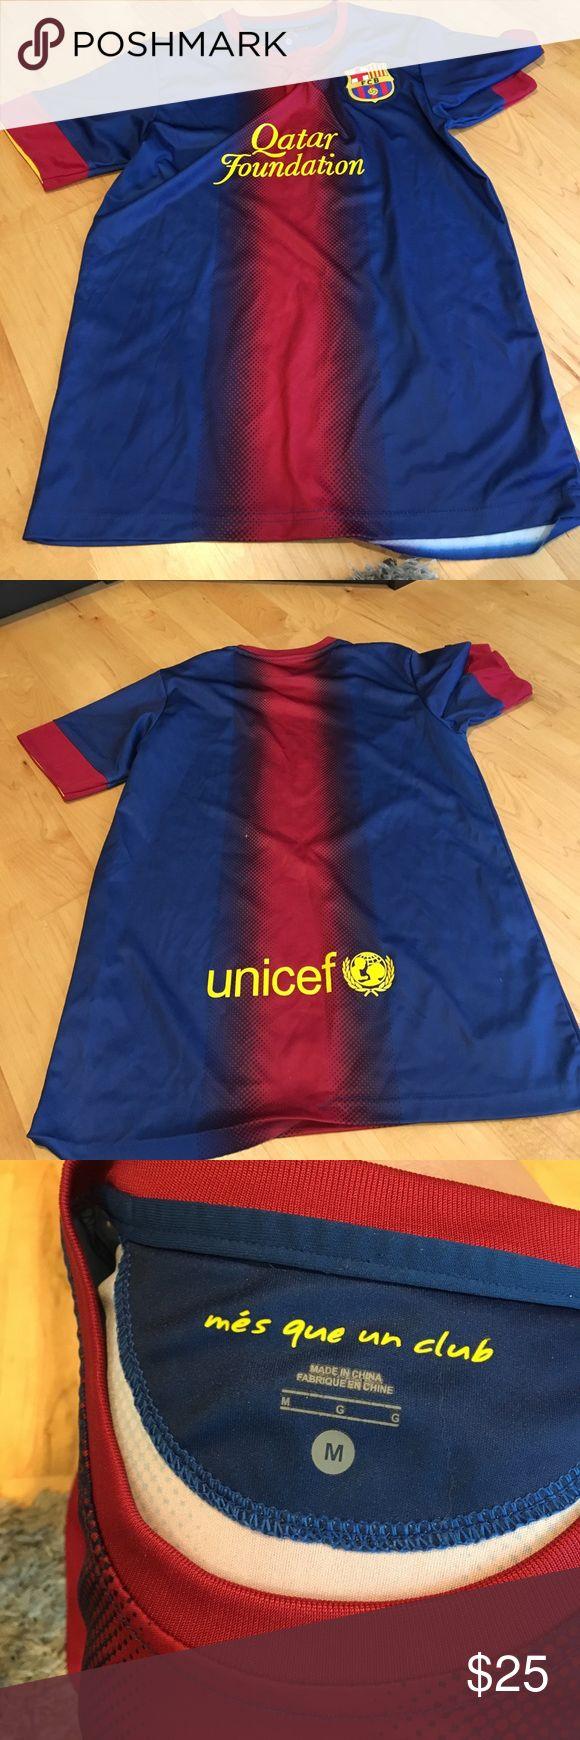 FC Barcelona Jersey Used once FC Barcelona shirt, smoke free home size medium Tops